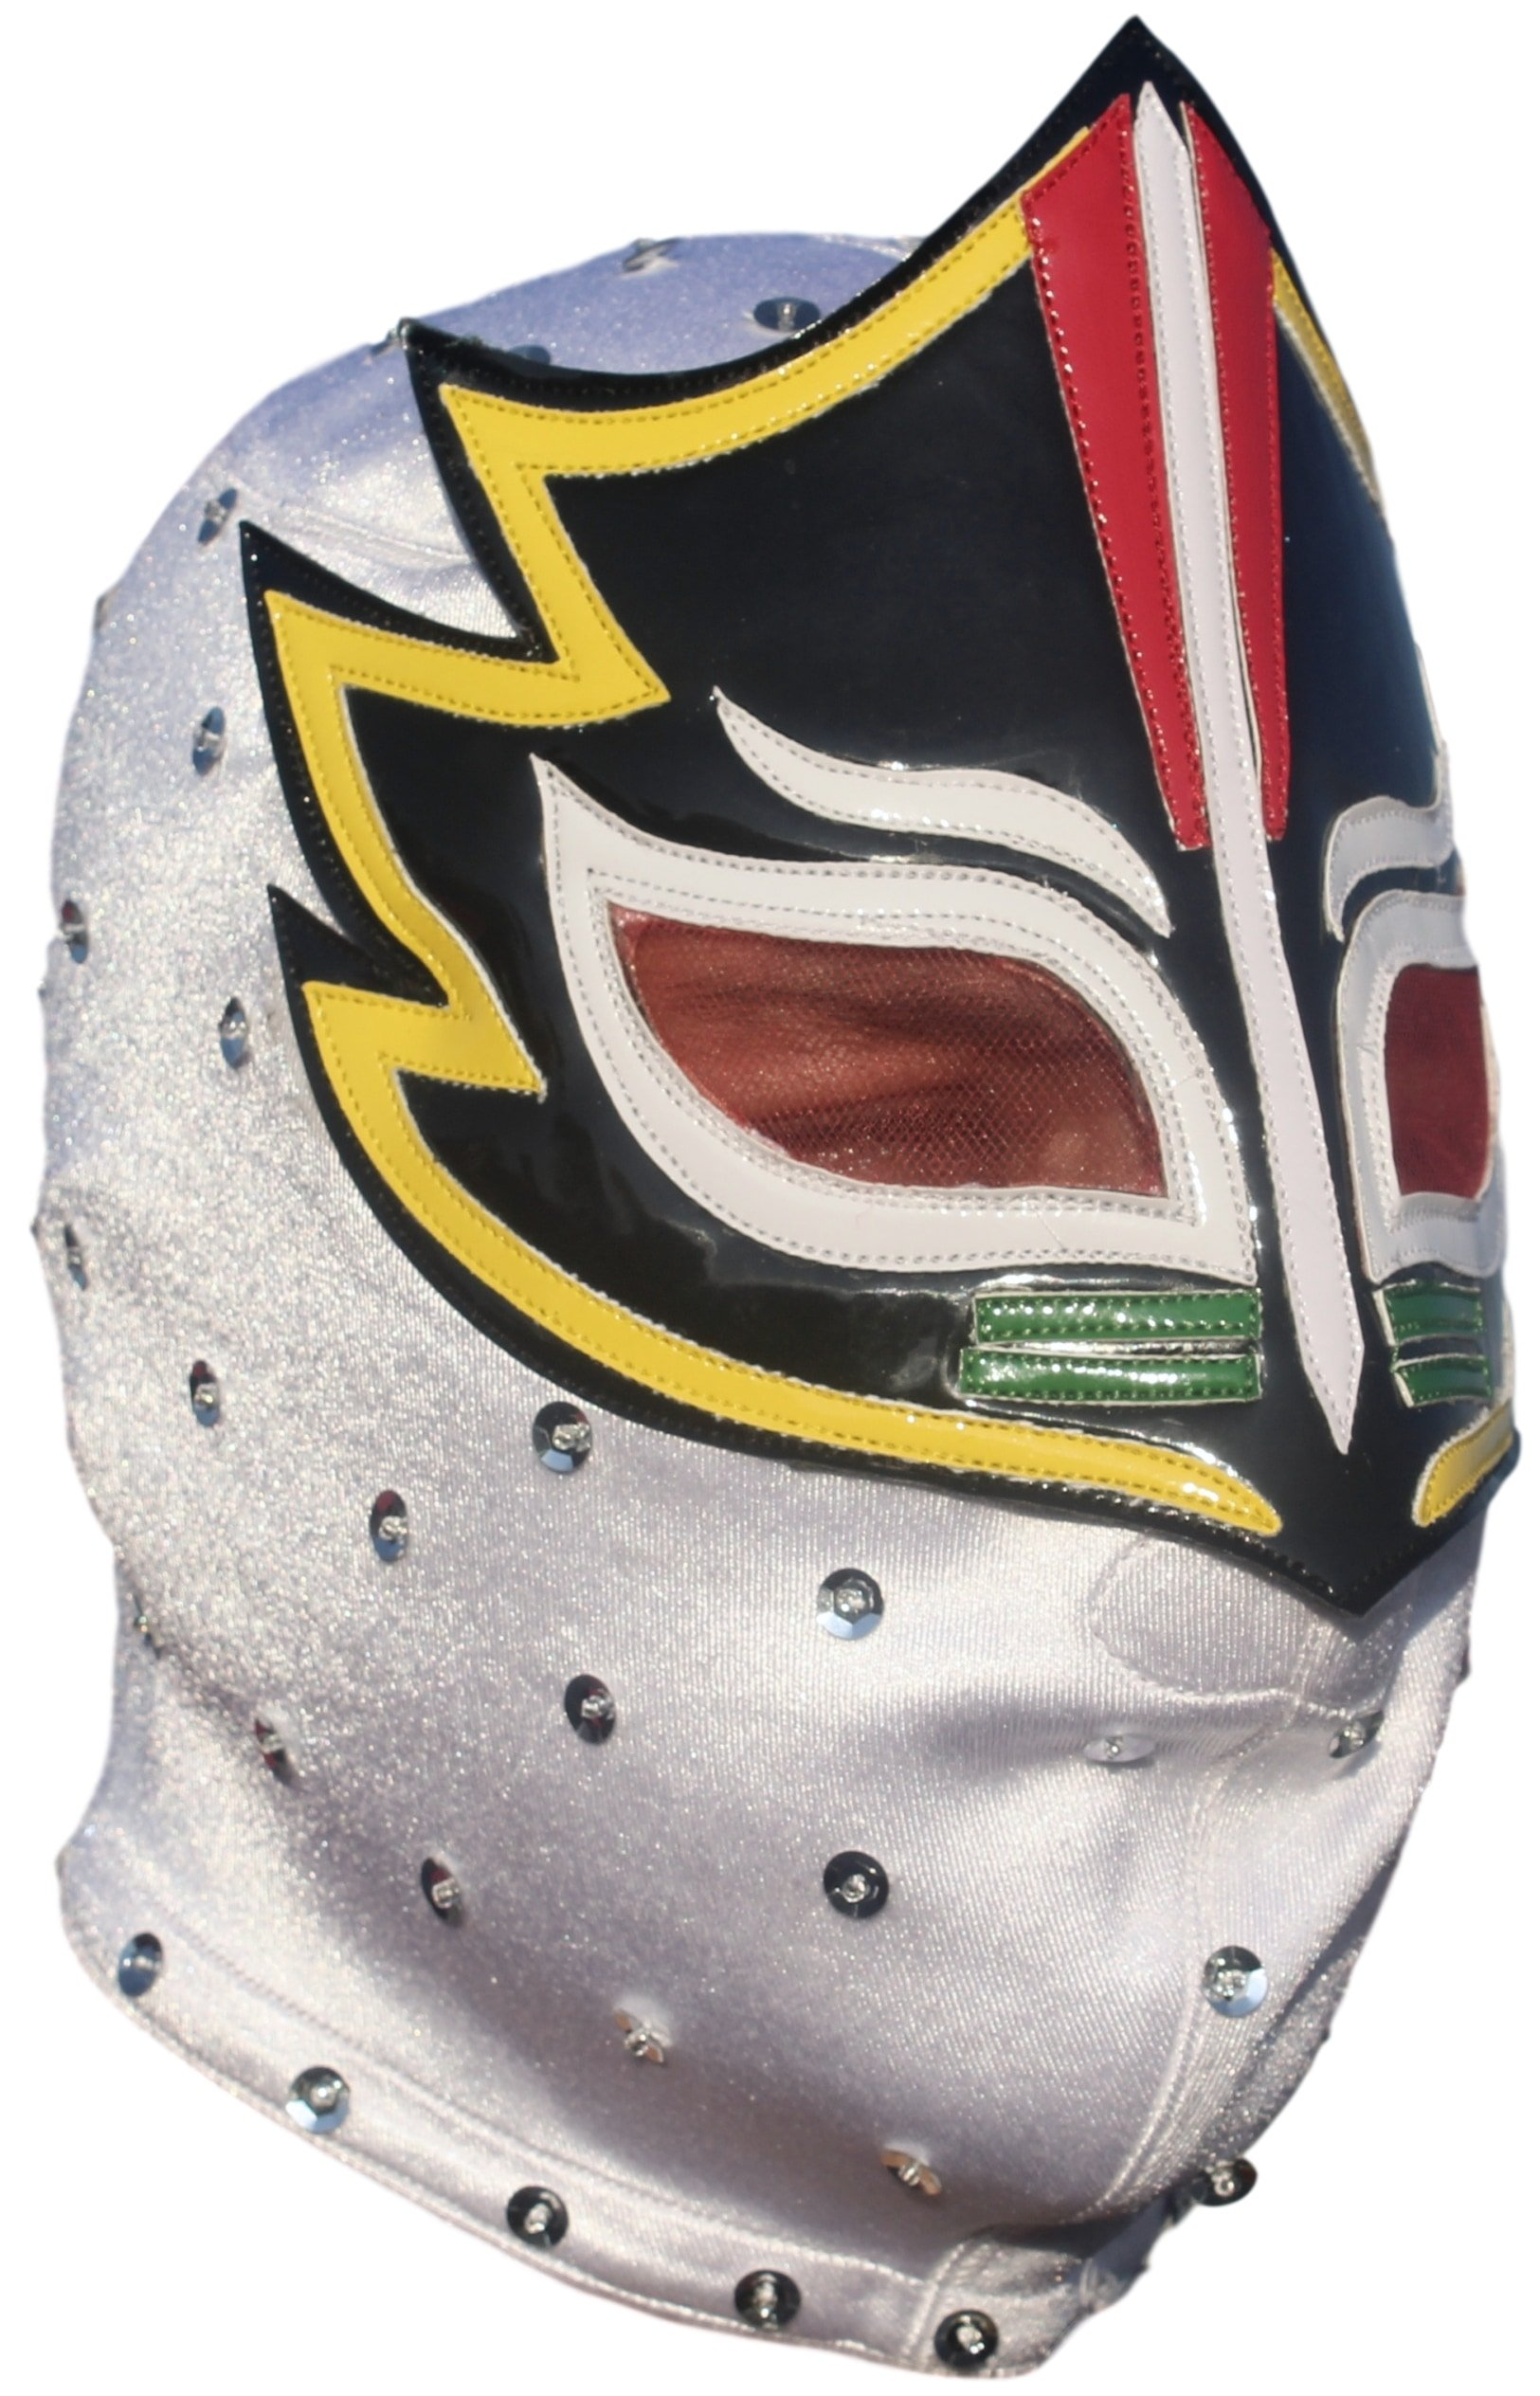 Deportes Martinez Mascara Sagrada Professional Lucha Libre Mask Adult Luchador Mask by Deportes Martinez